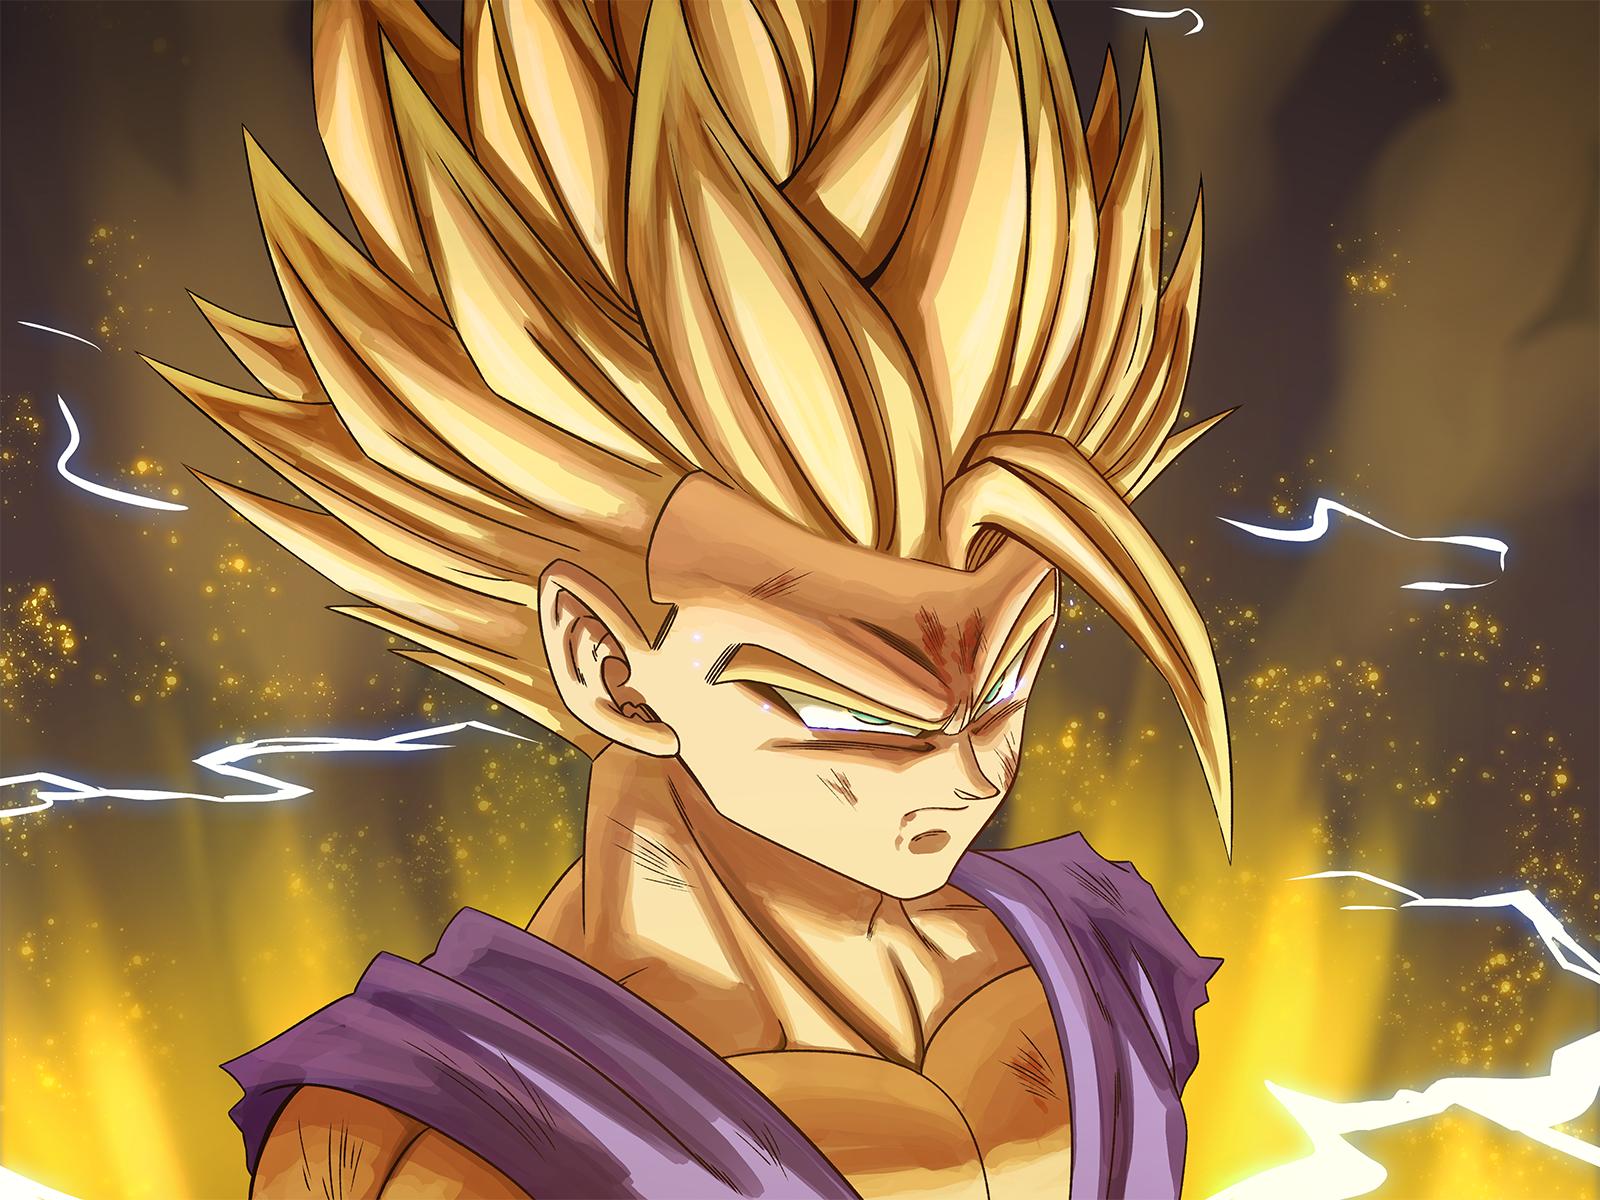 Kid Gohan Ssj2 Oc Dbz Anime Dragon Ball Super Dragon Ball Im